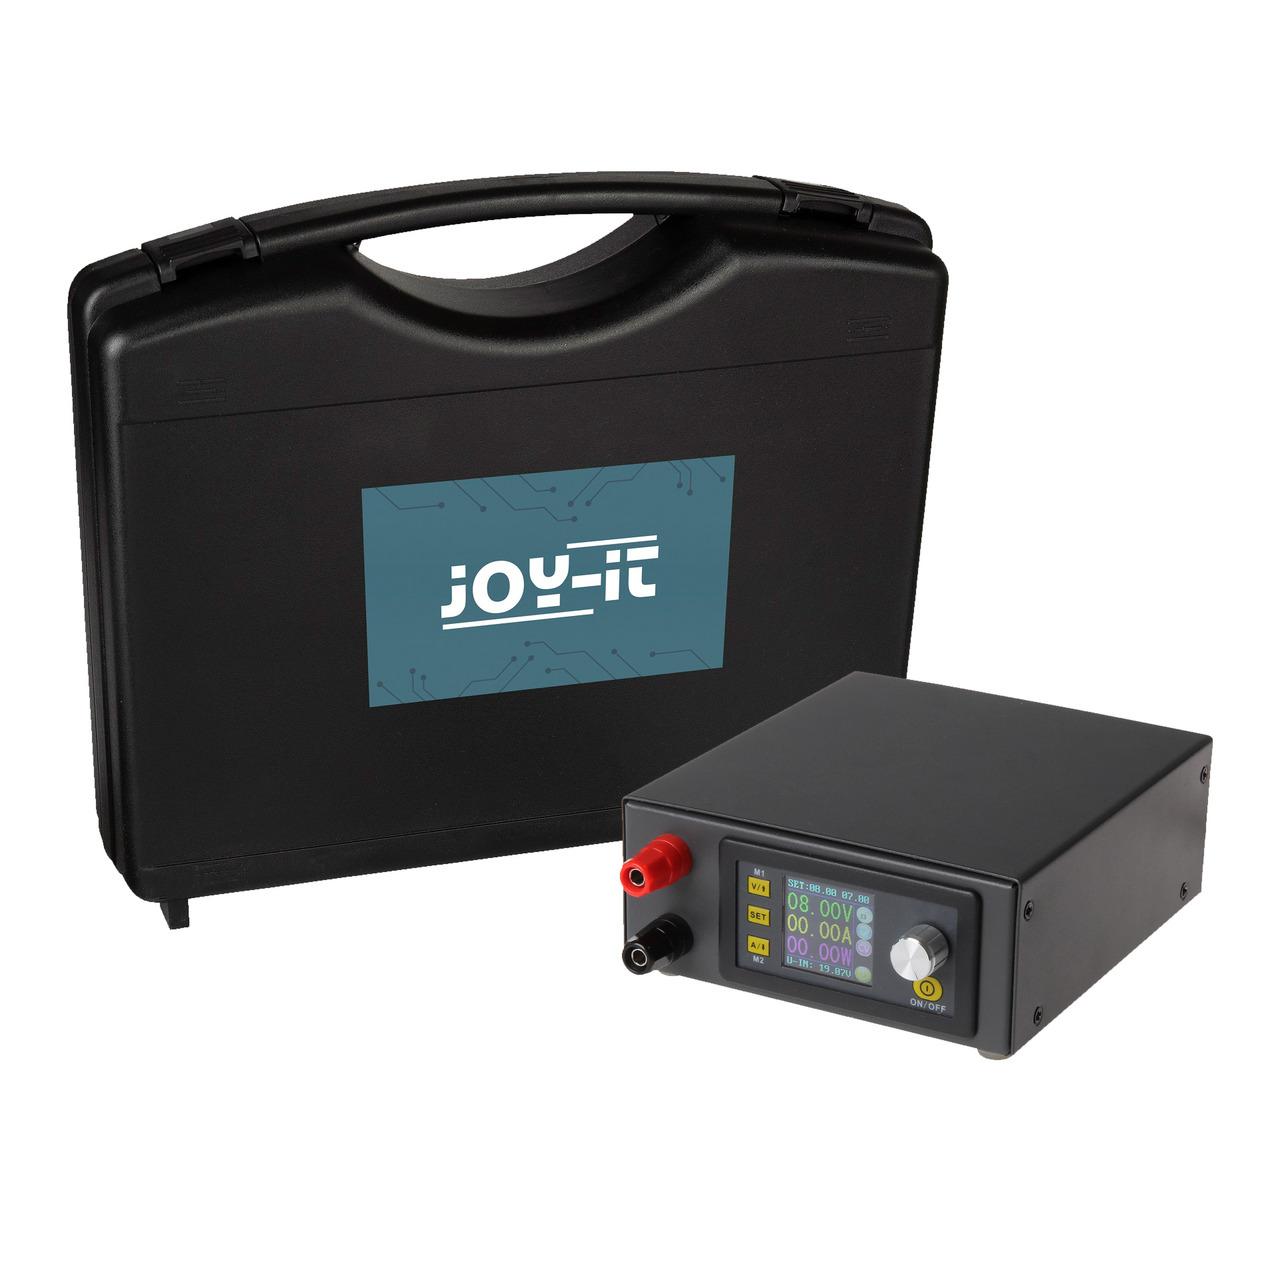 Joy-IT Step-up-Step-down-Labornetzgerät JT-DPH5005 Set- inkl- Gehäuse und Zubehör- 0-50 V-0-5 A